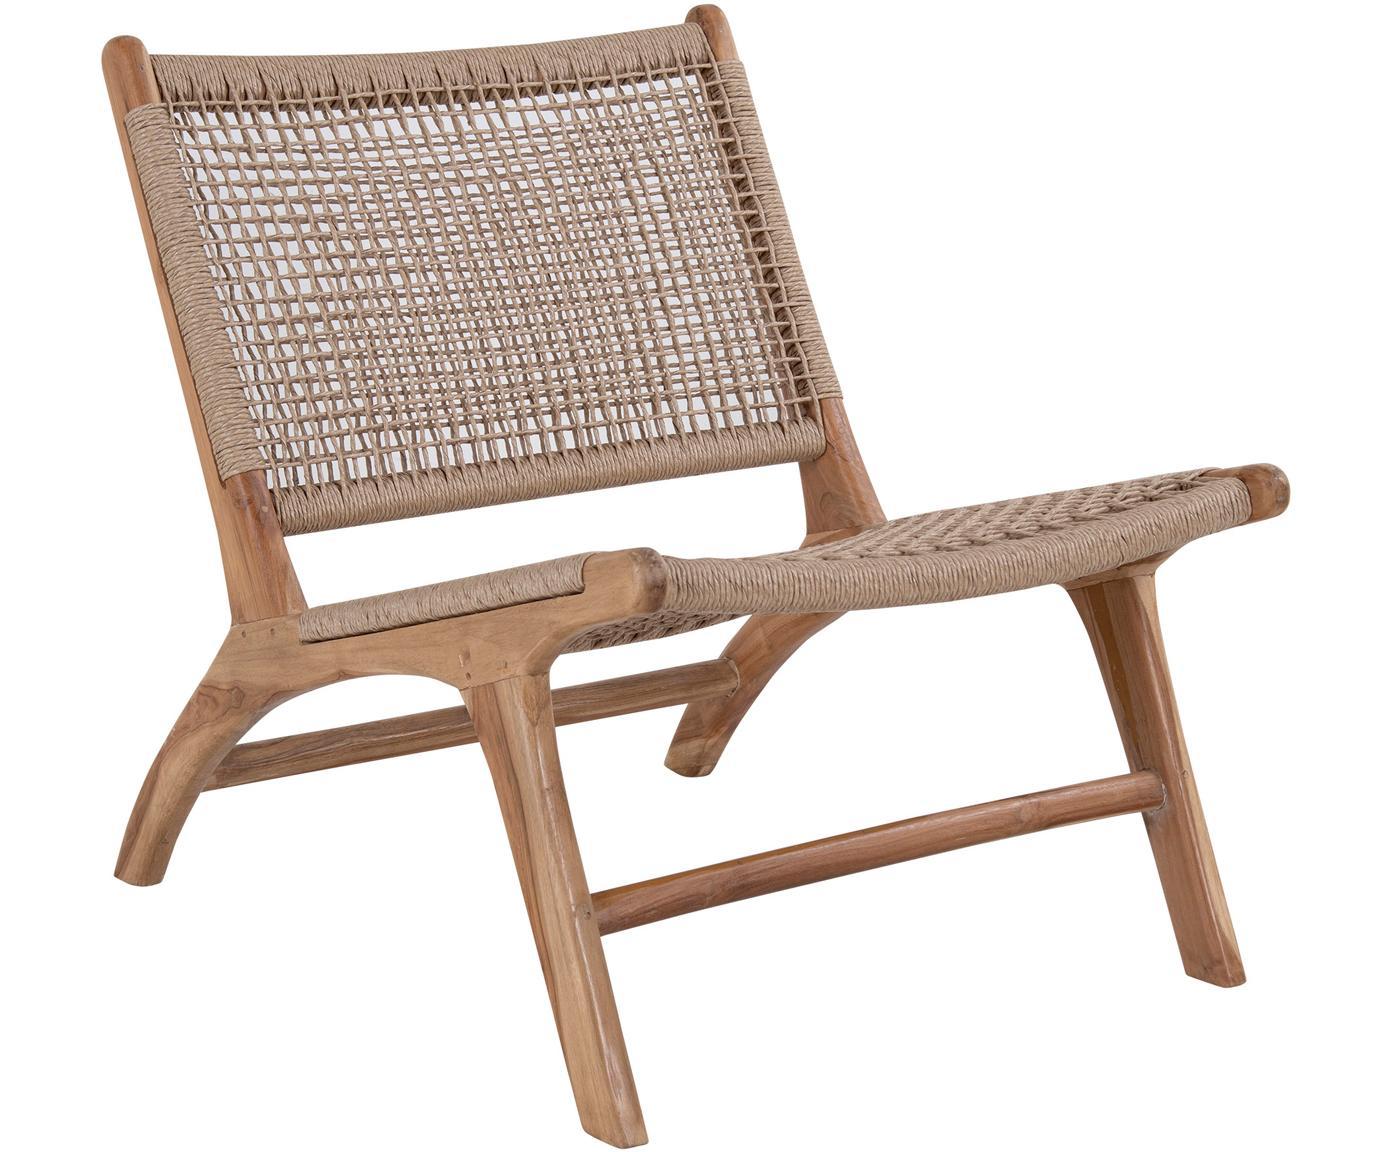 Loungefauteuil Derby, Teakhout, polyrotan, Teakhoutkleurig, beige, B 60 x D 80 cm